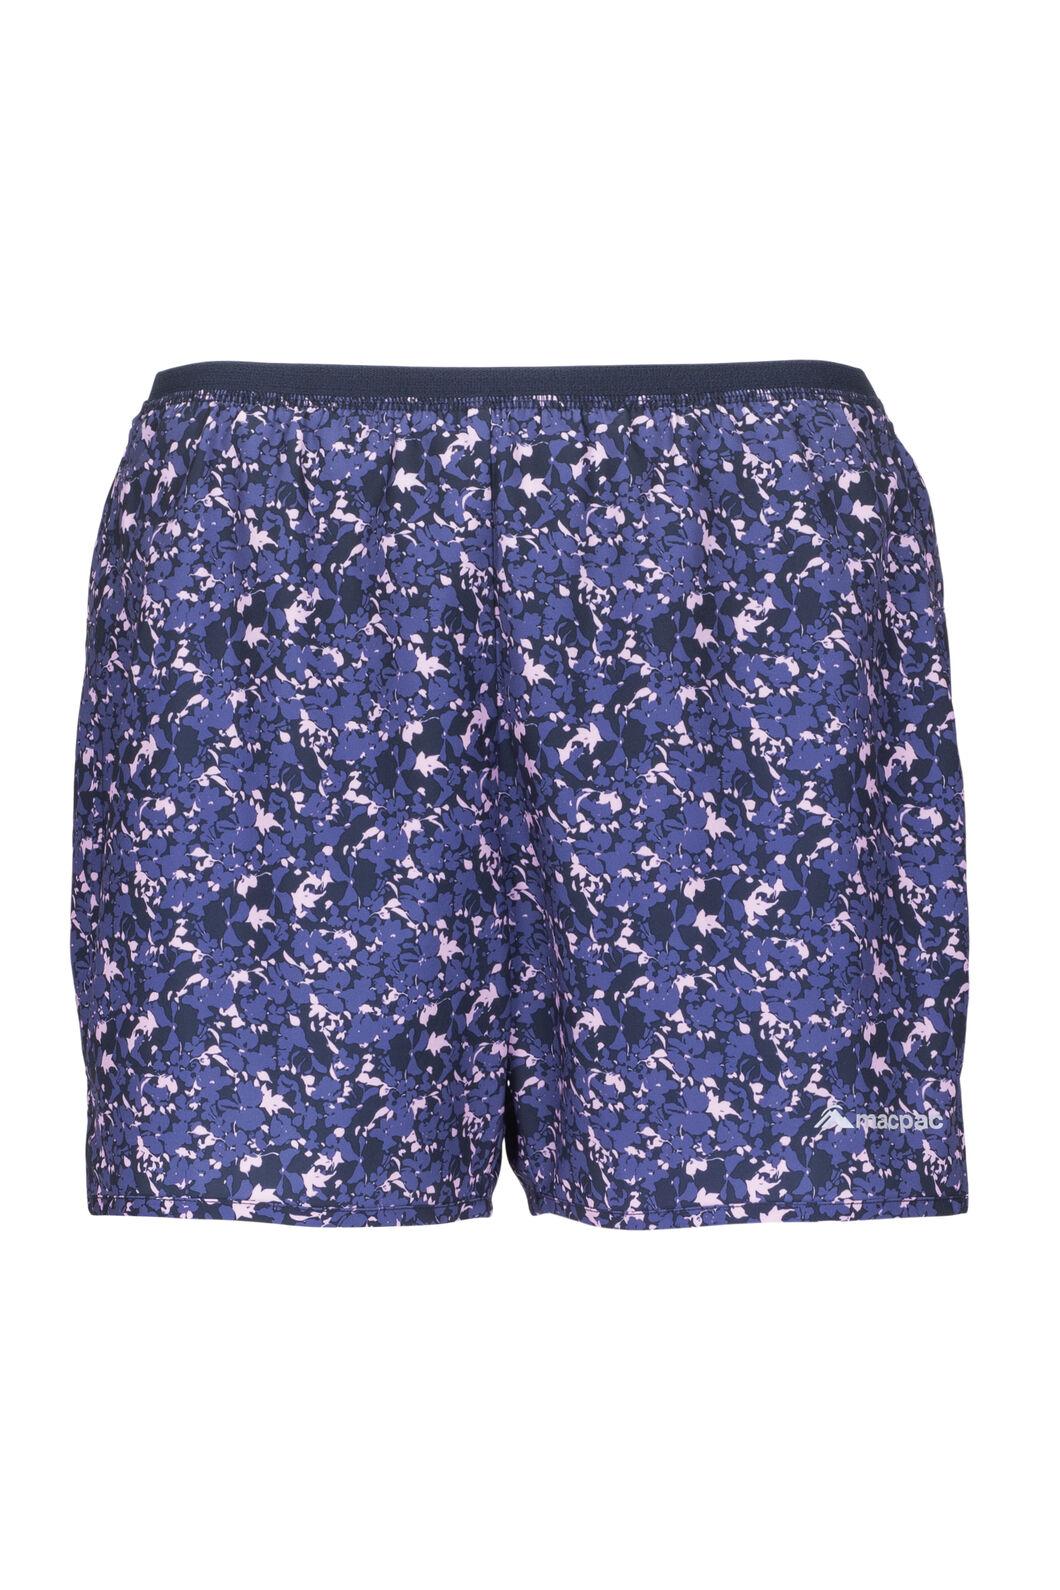 Macpac Caples Trail Shorts — Women's, Orchid Print, hi-res